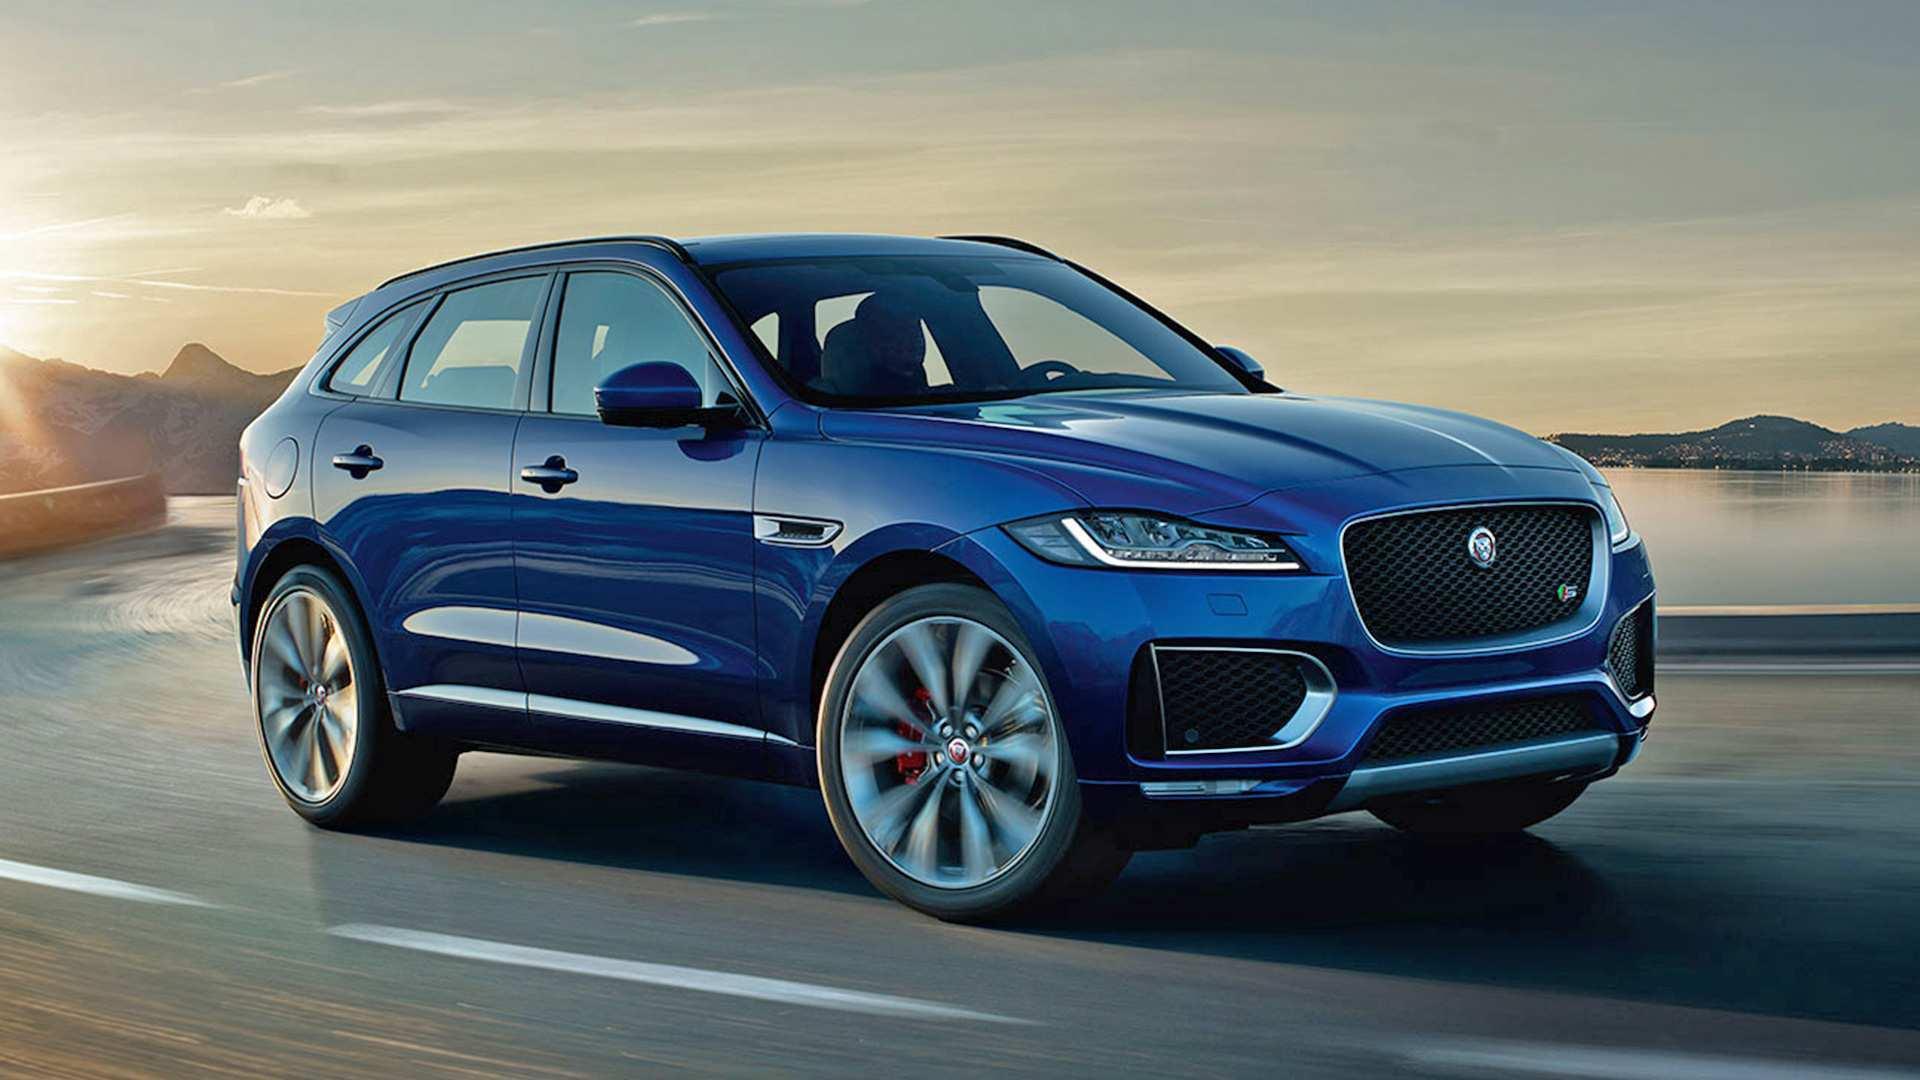 89 Gallery of The 2019 Jaguar Price In India Spesification Model with The 2019 Jaguar Price In India Spesification